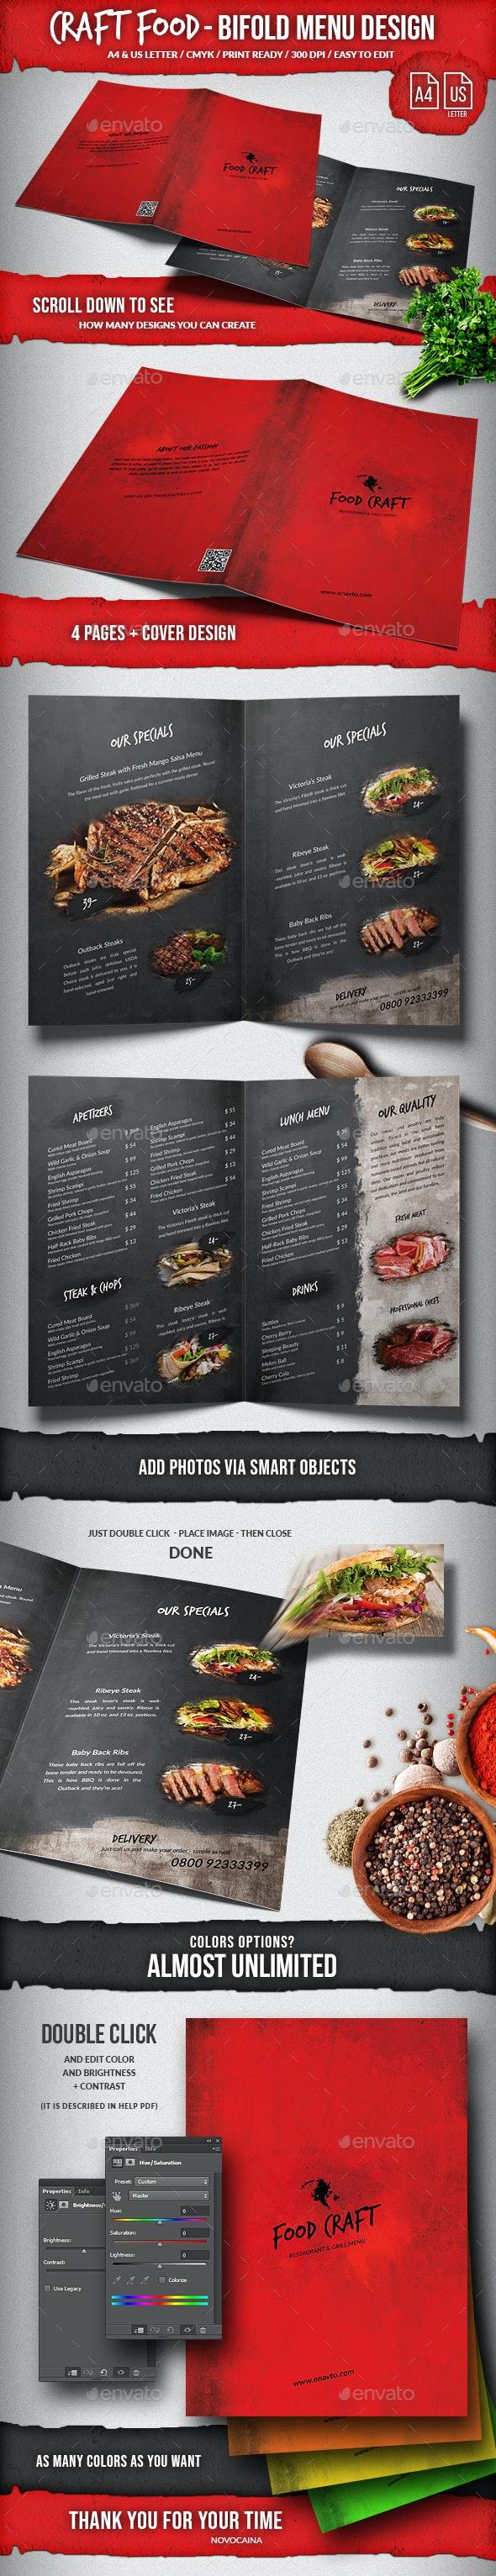 Craft Food Bifold Menu - A4 & US Letter. Very Editable. - Food Menus Print Templates